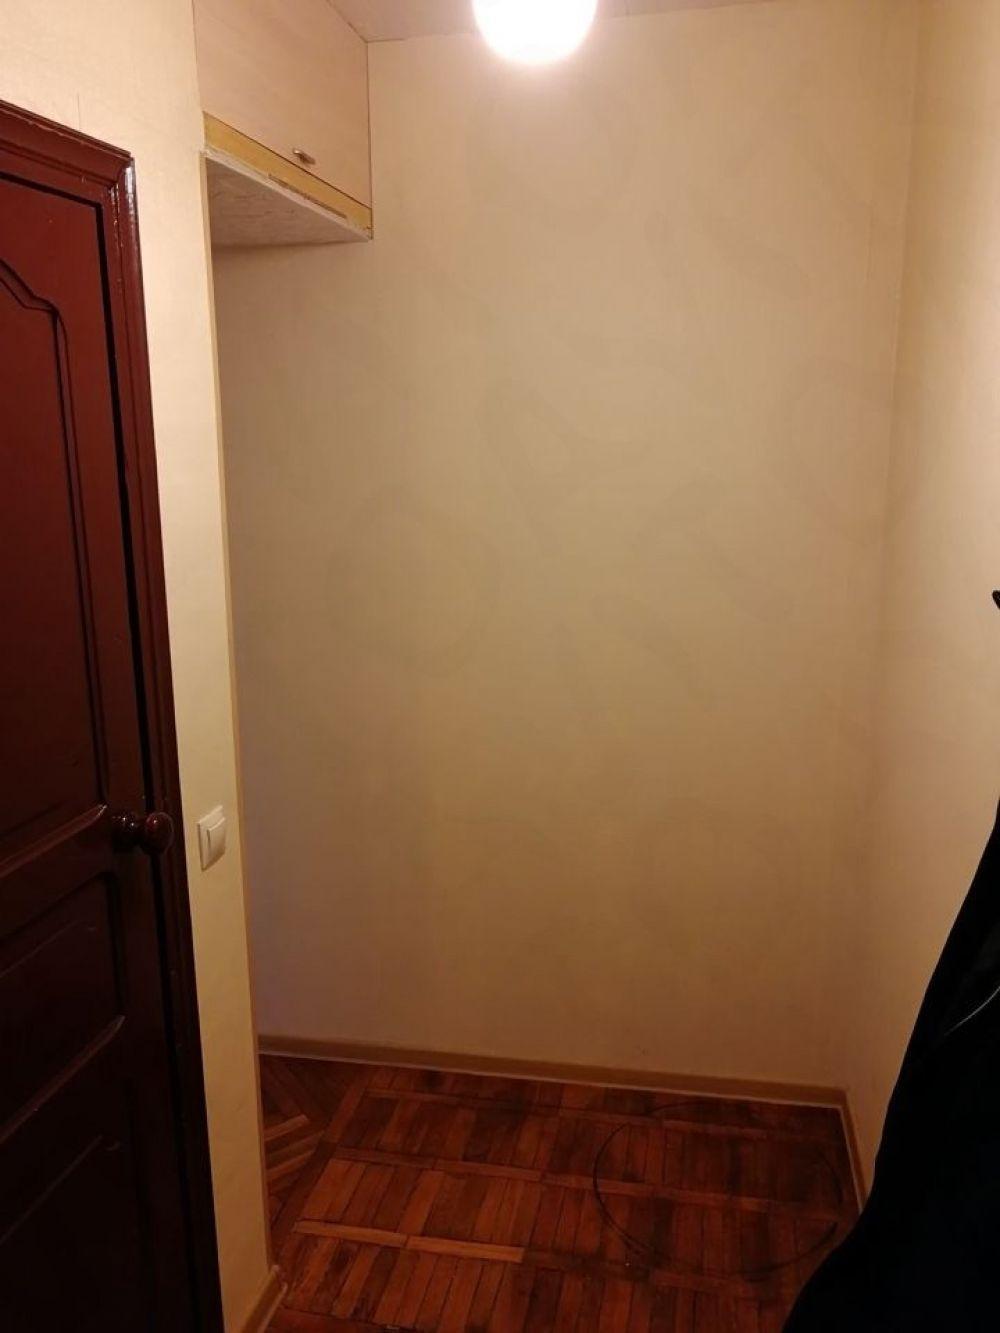 1-к квартира, Щёлково, Парковая улица, 5А, фото 19